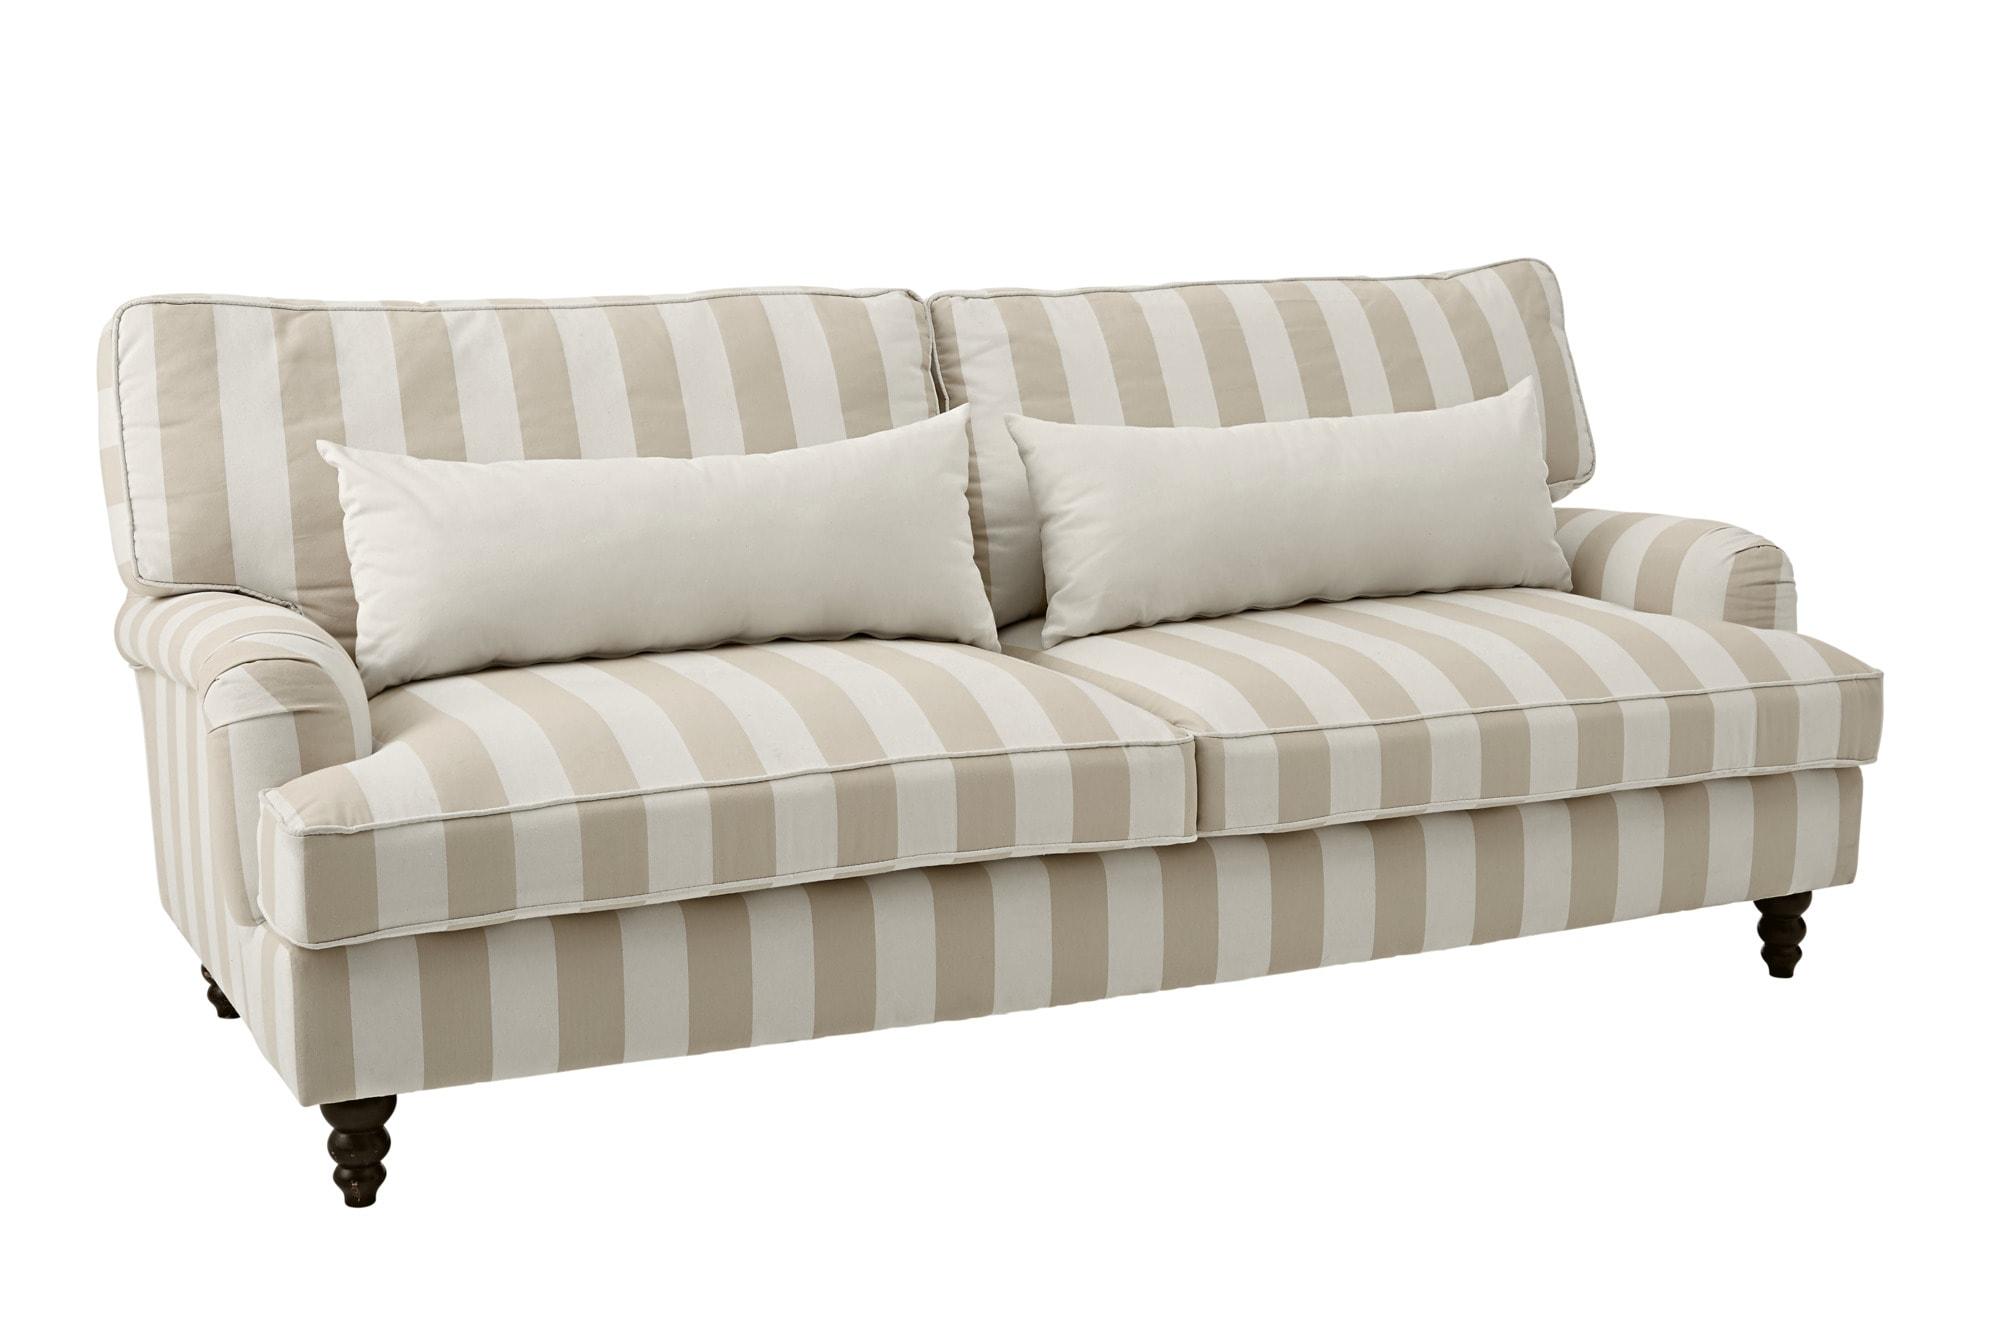 heine home Sofa Preisvergleich